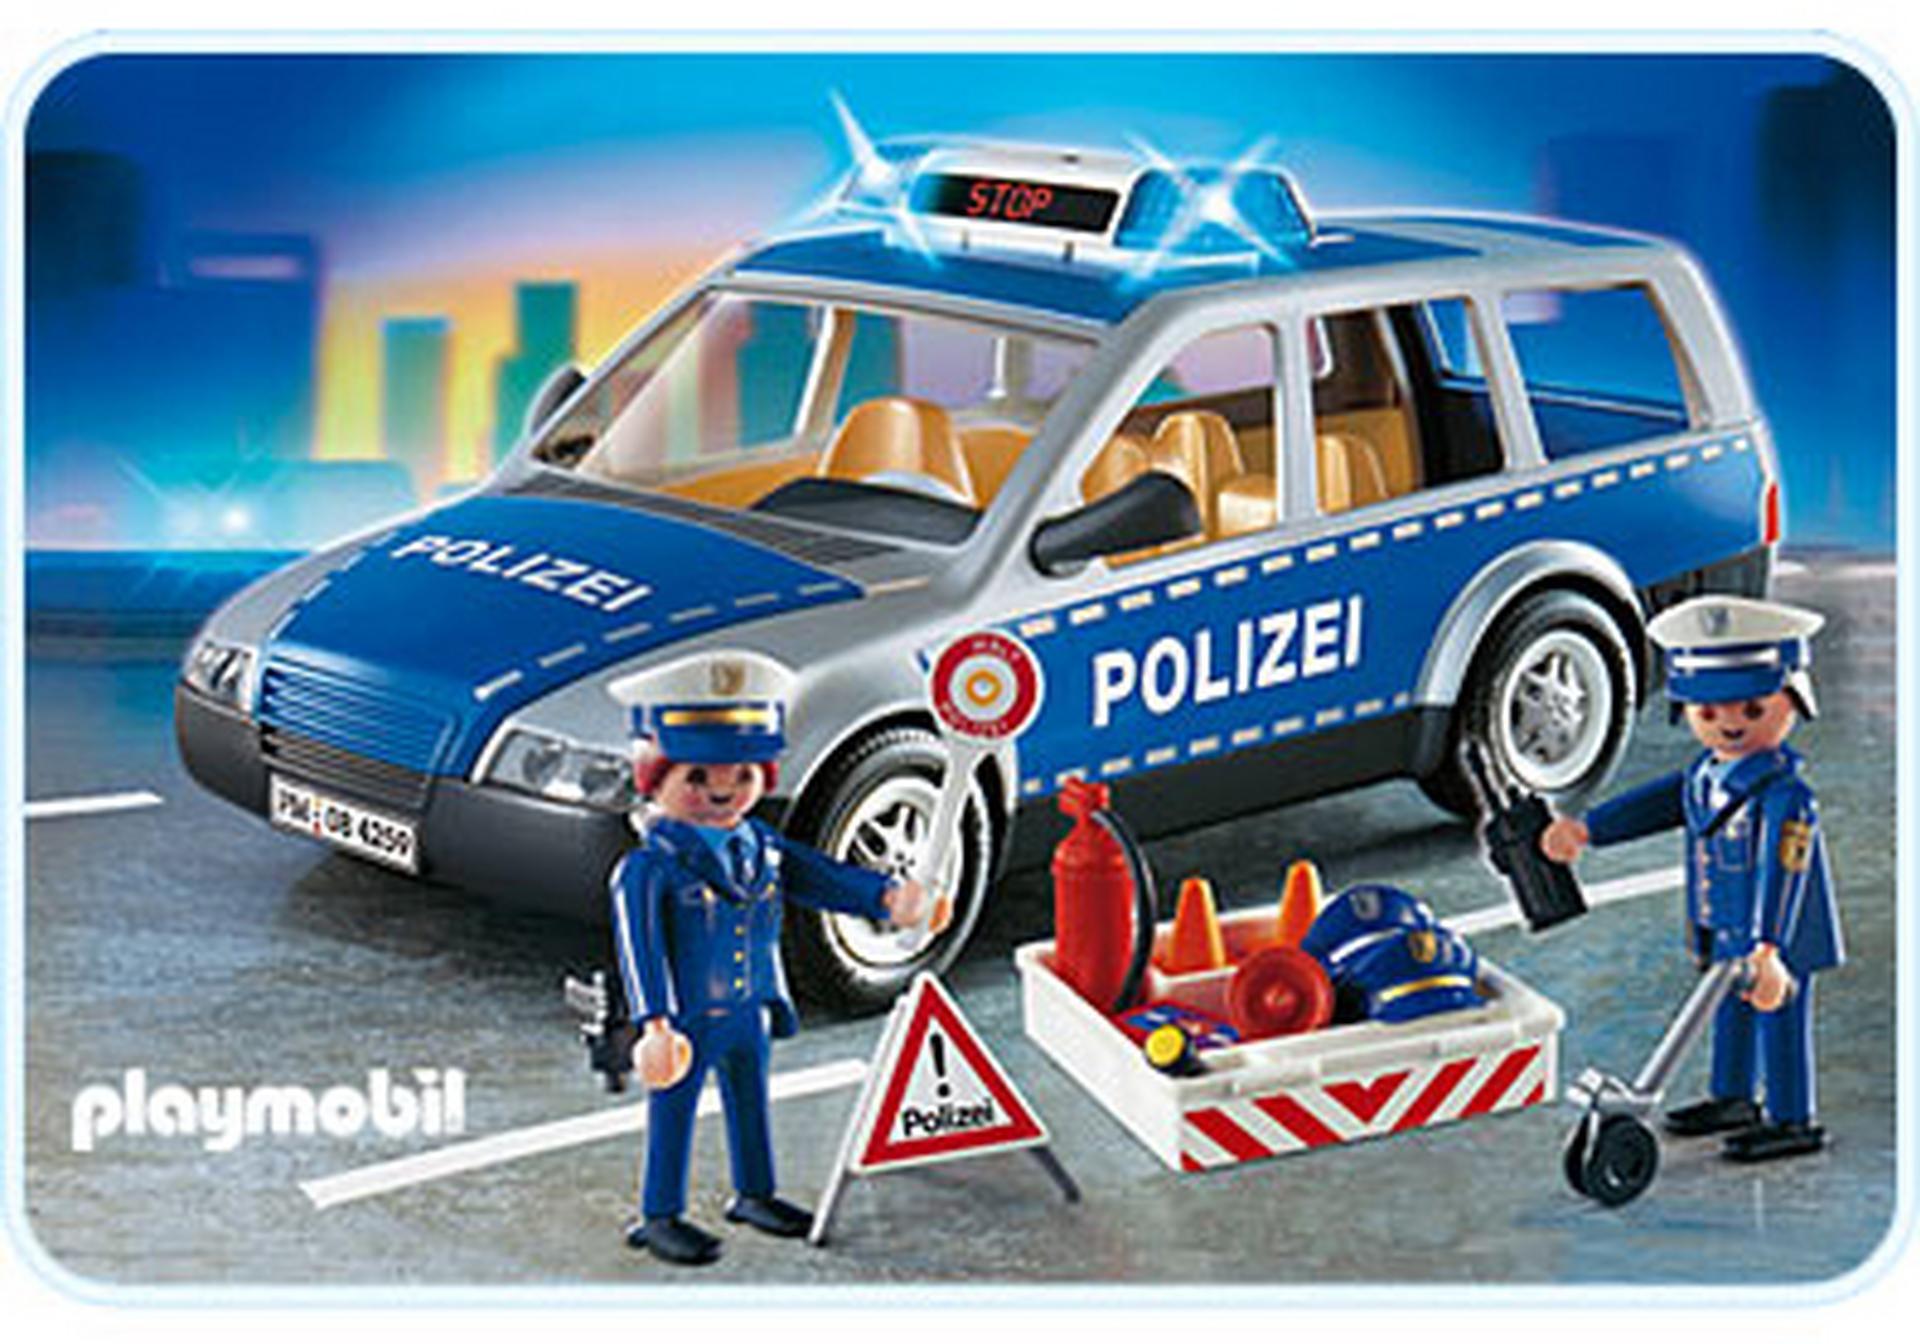 polizeieinsatzwagen  4259a  playmobil® schweiz